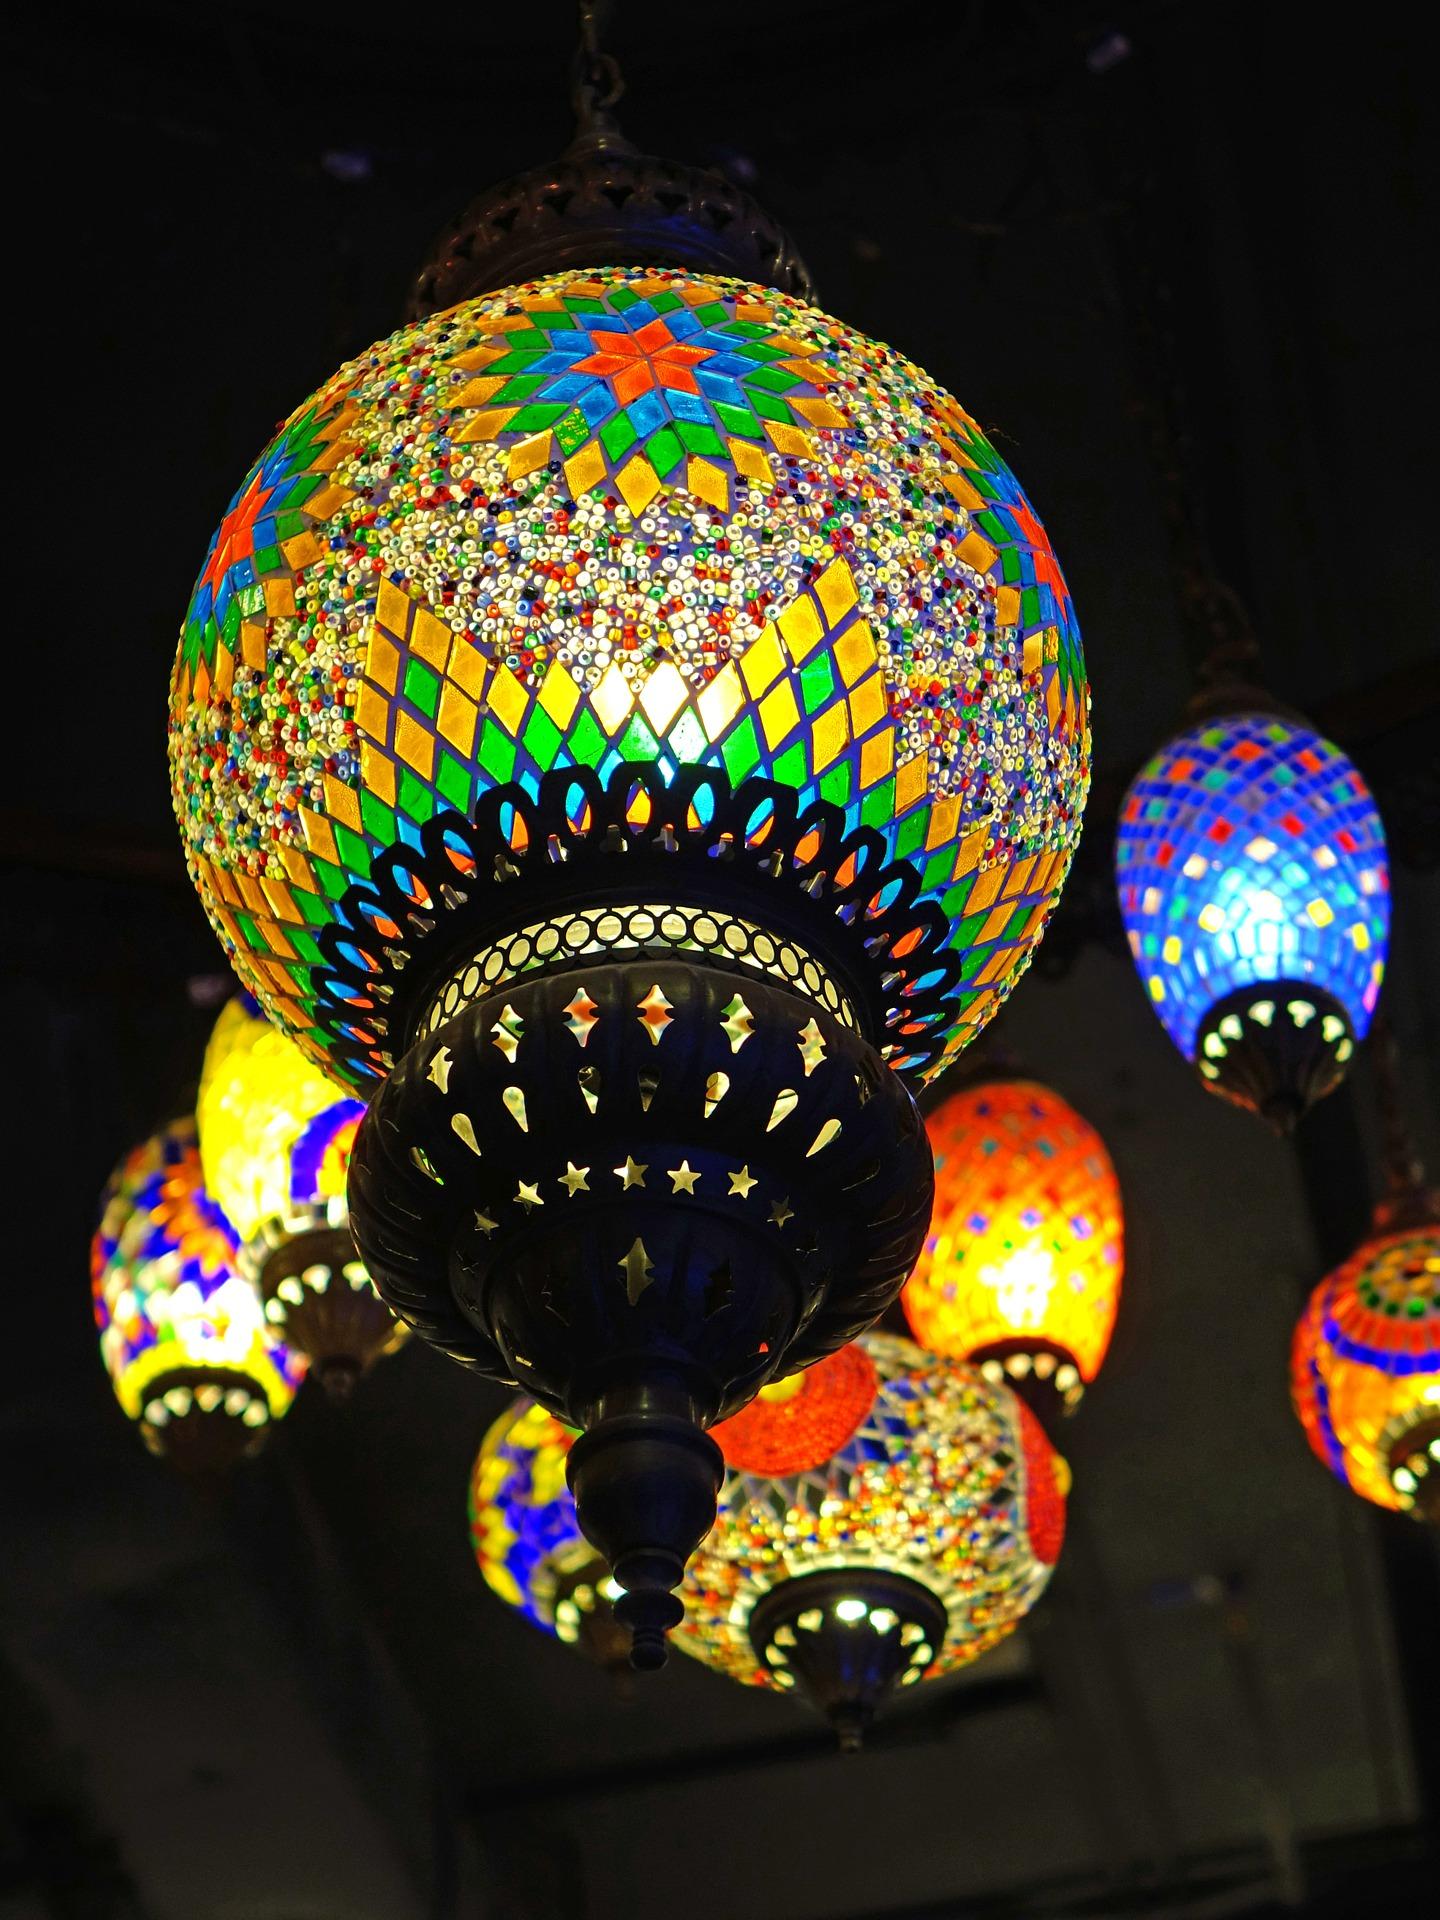 Modern Lanterns, Glow, Lamp, Lantern, Light, HQ Photo